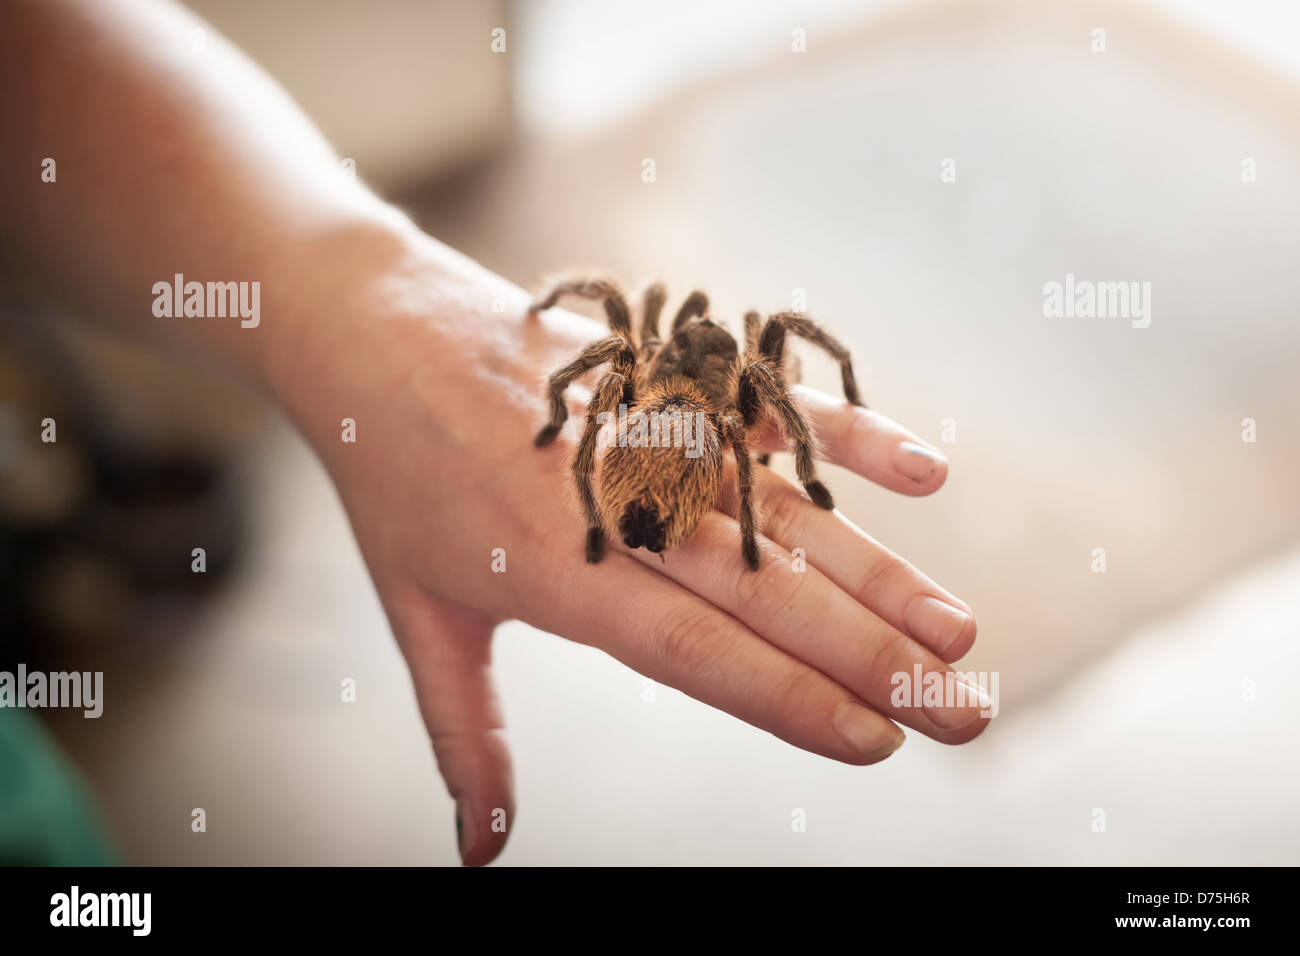 Pelosi pet marrone Tarantola spider seduto su una mano umana Immagini Stock